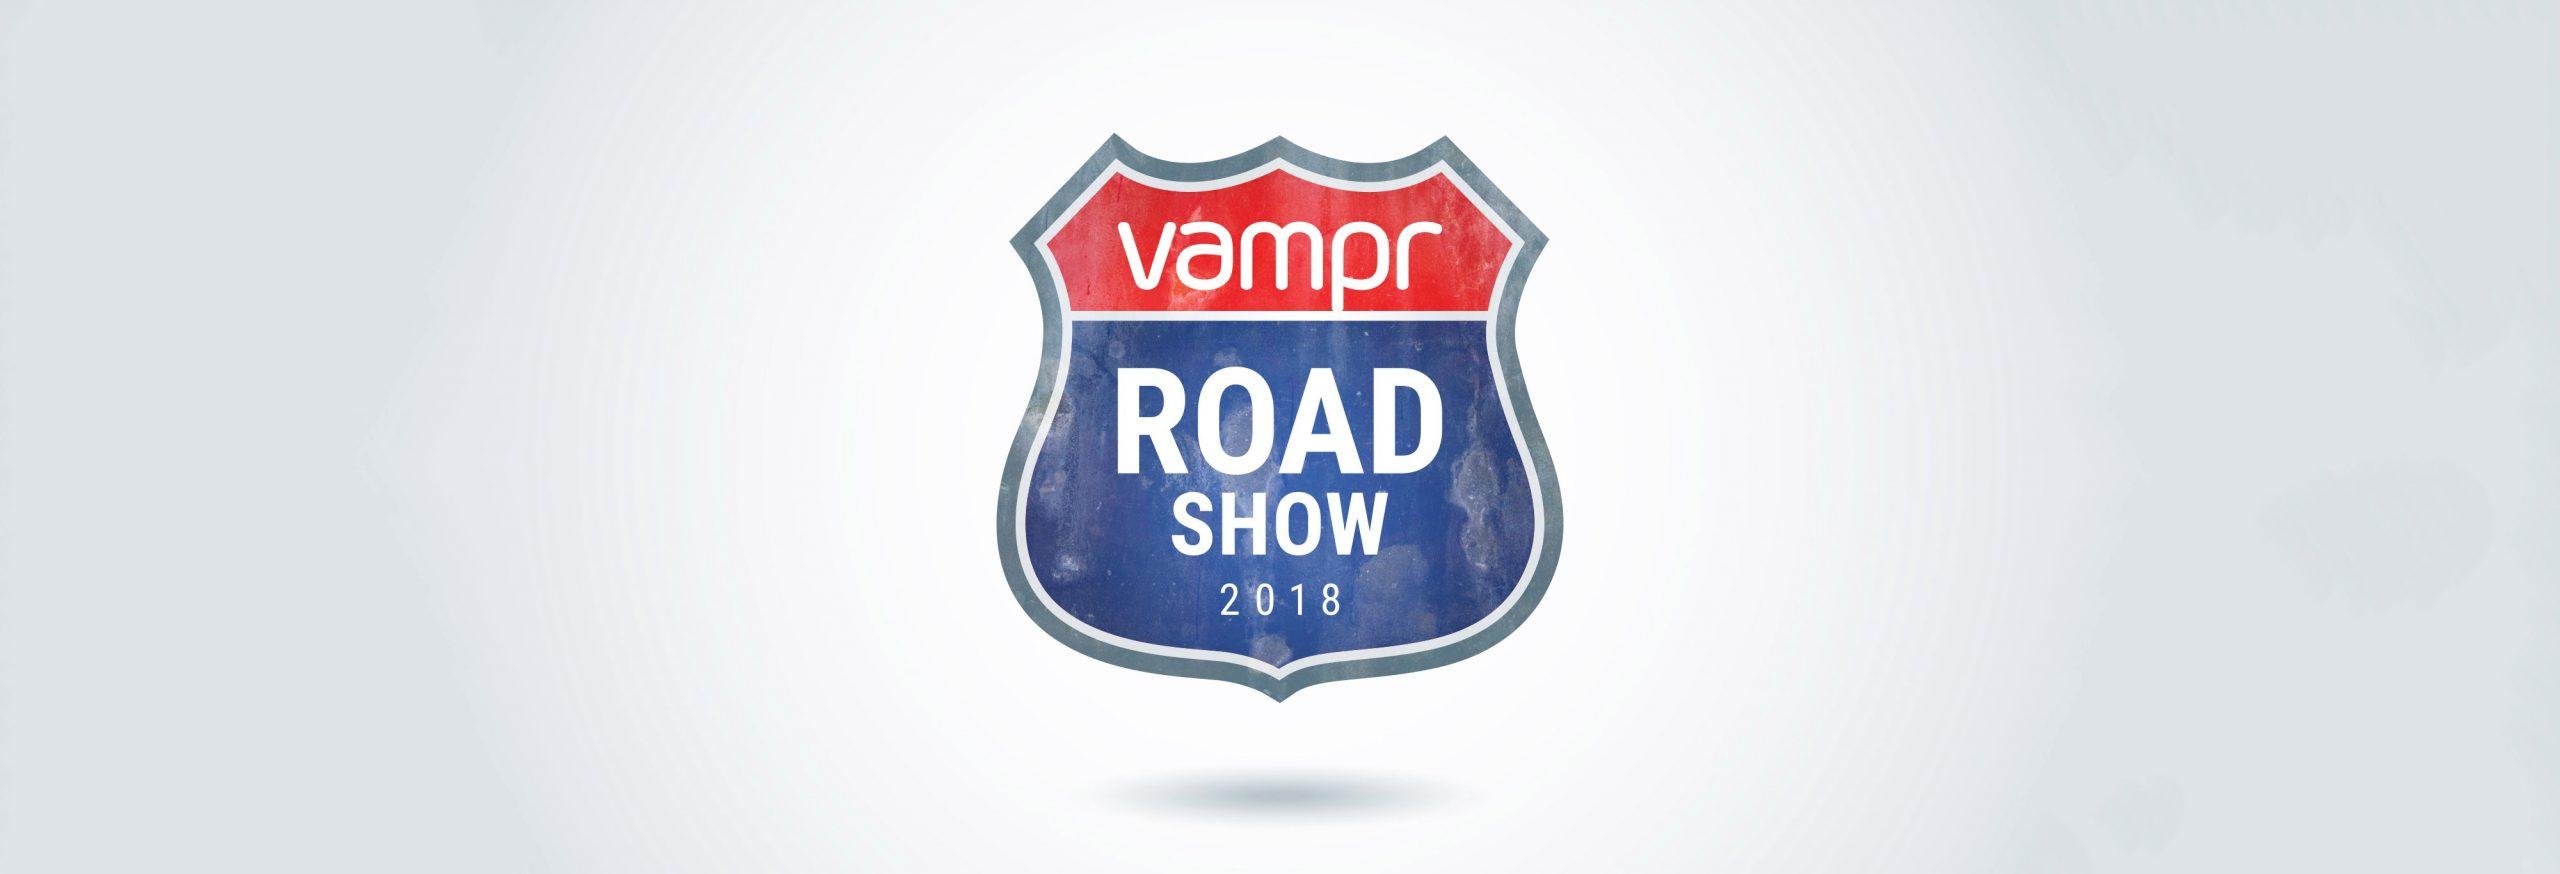 Vampr Roadshow 2018